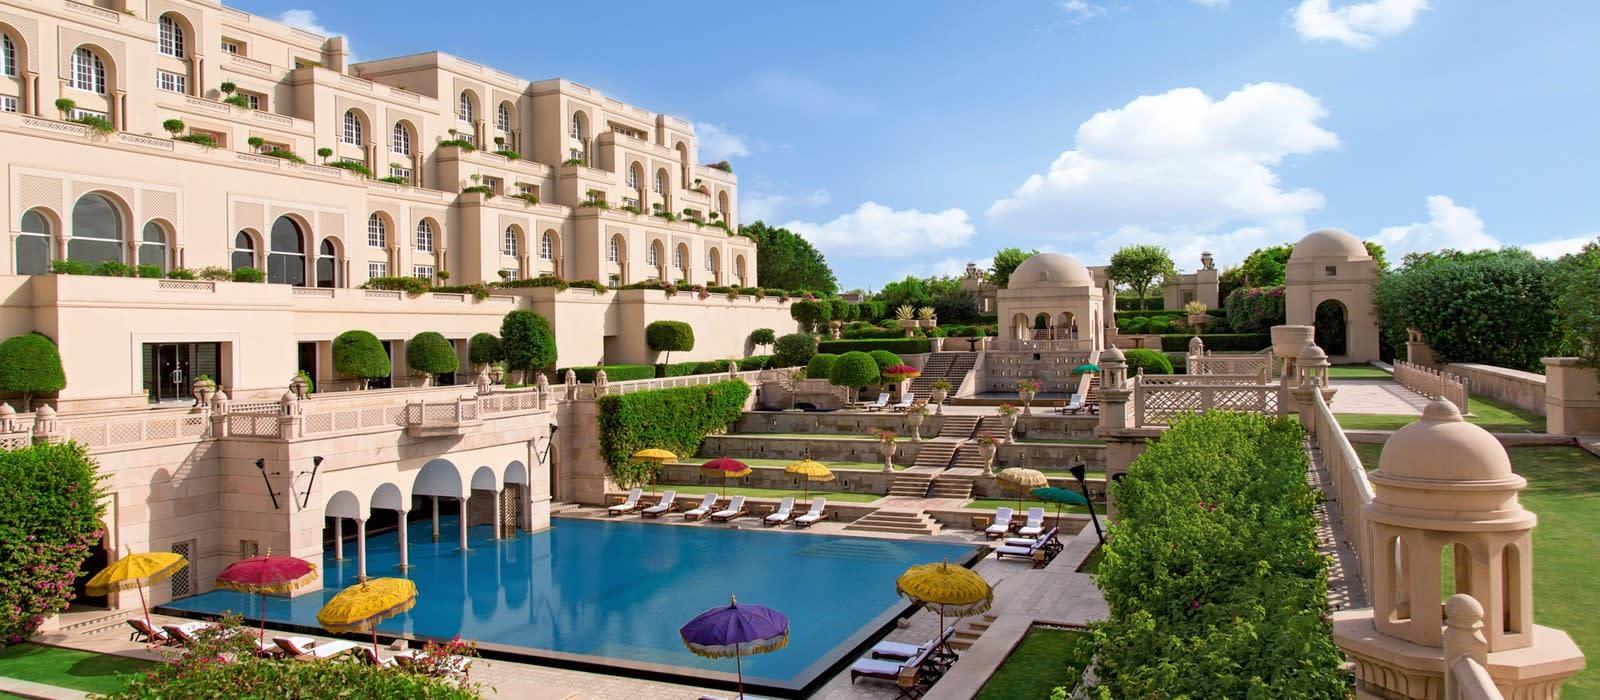 Hotel The Oberoi Amarvilas, Agra Nordindien